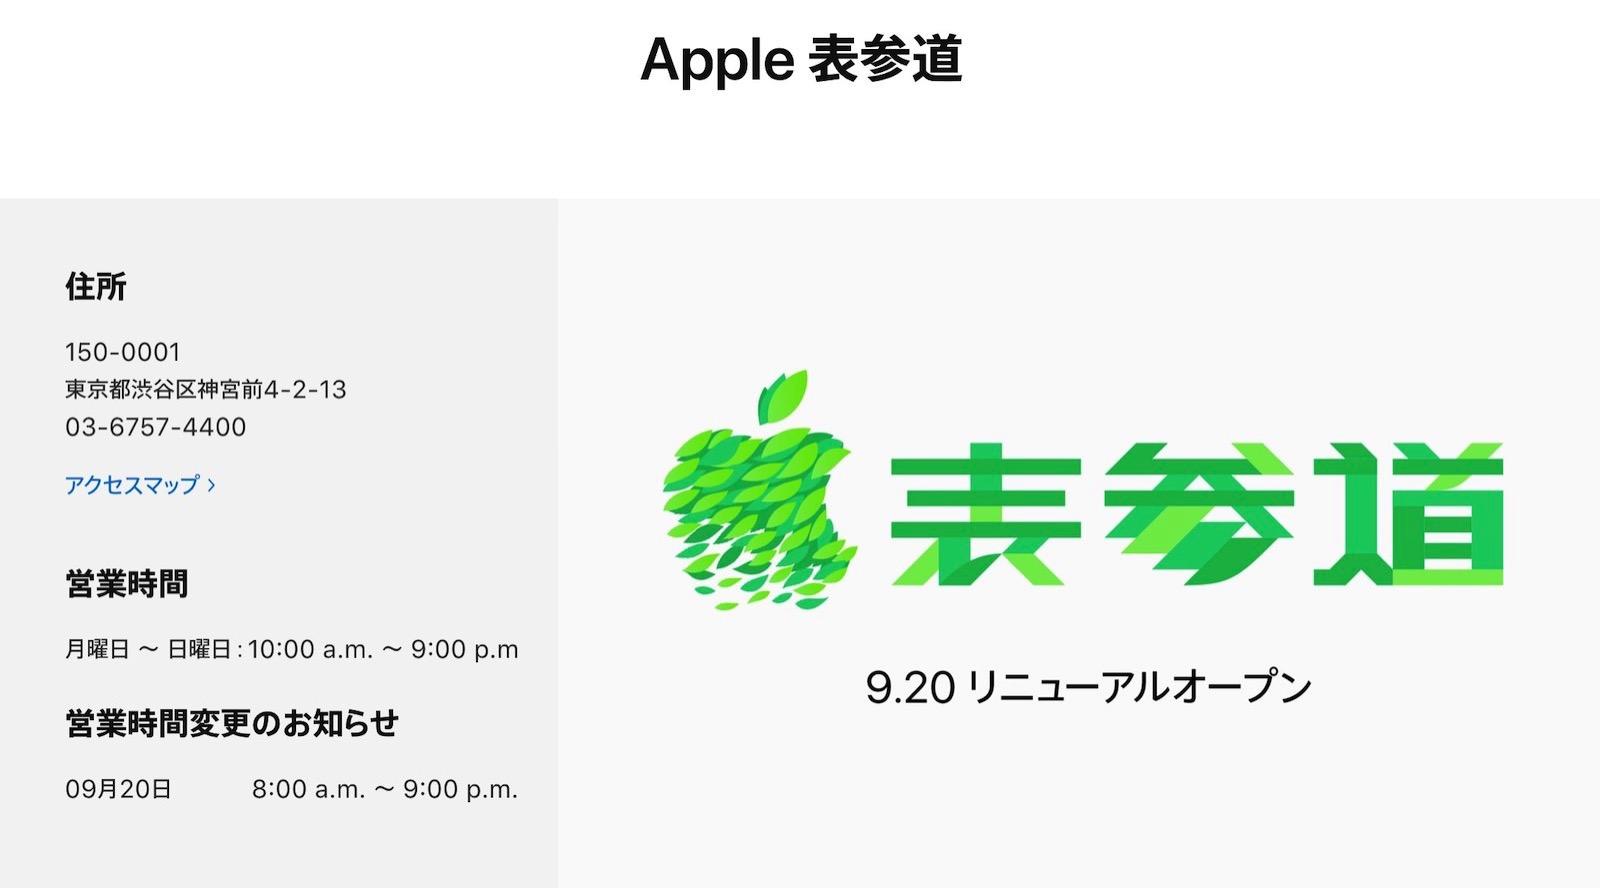 Apple Omotesando Renewal Open Sep20